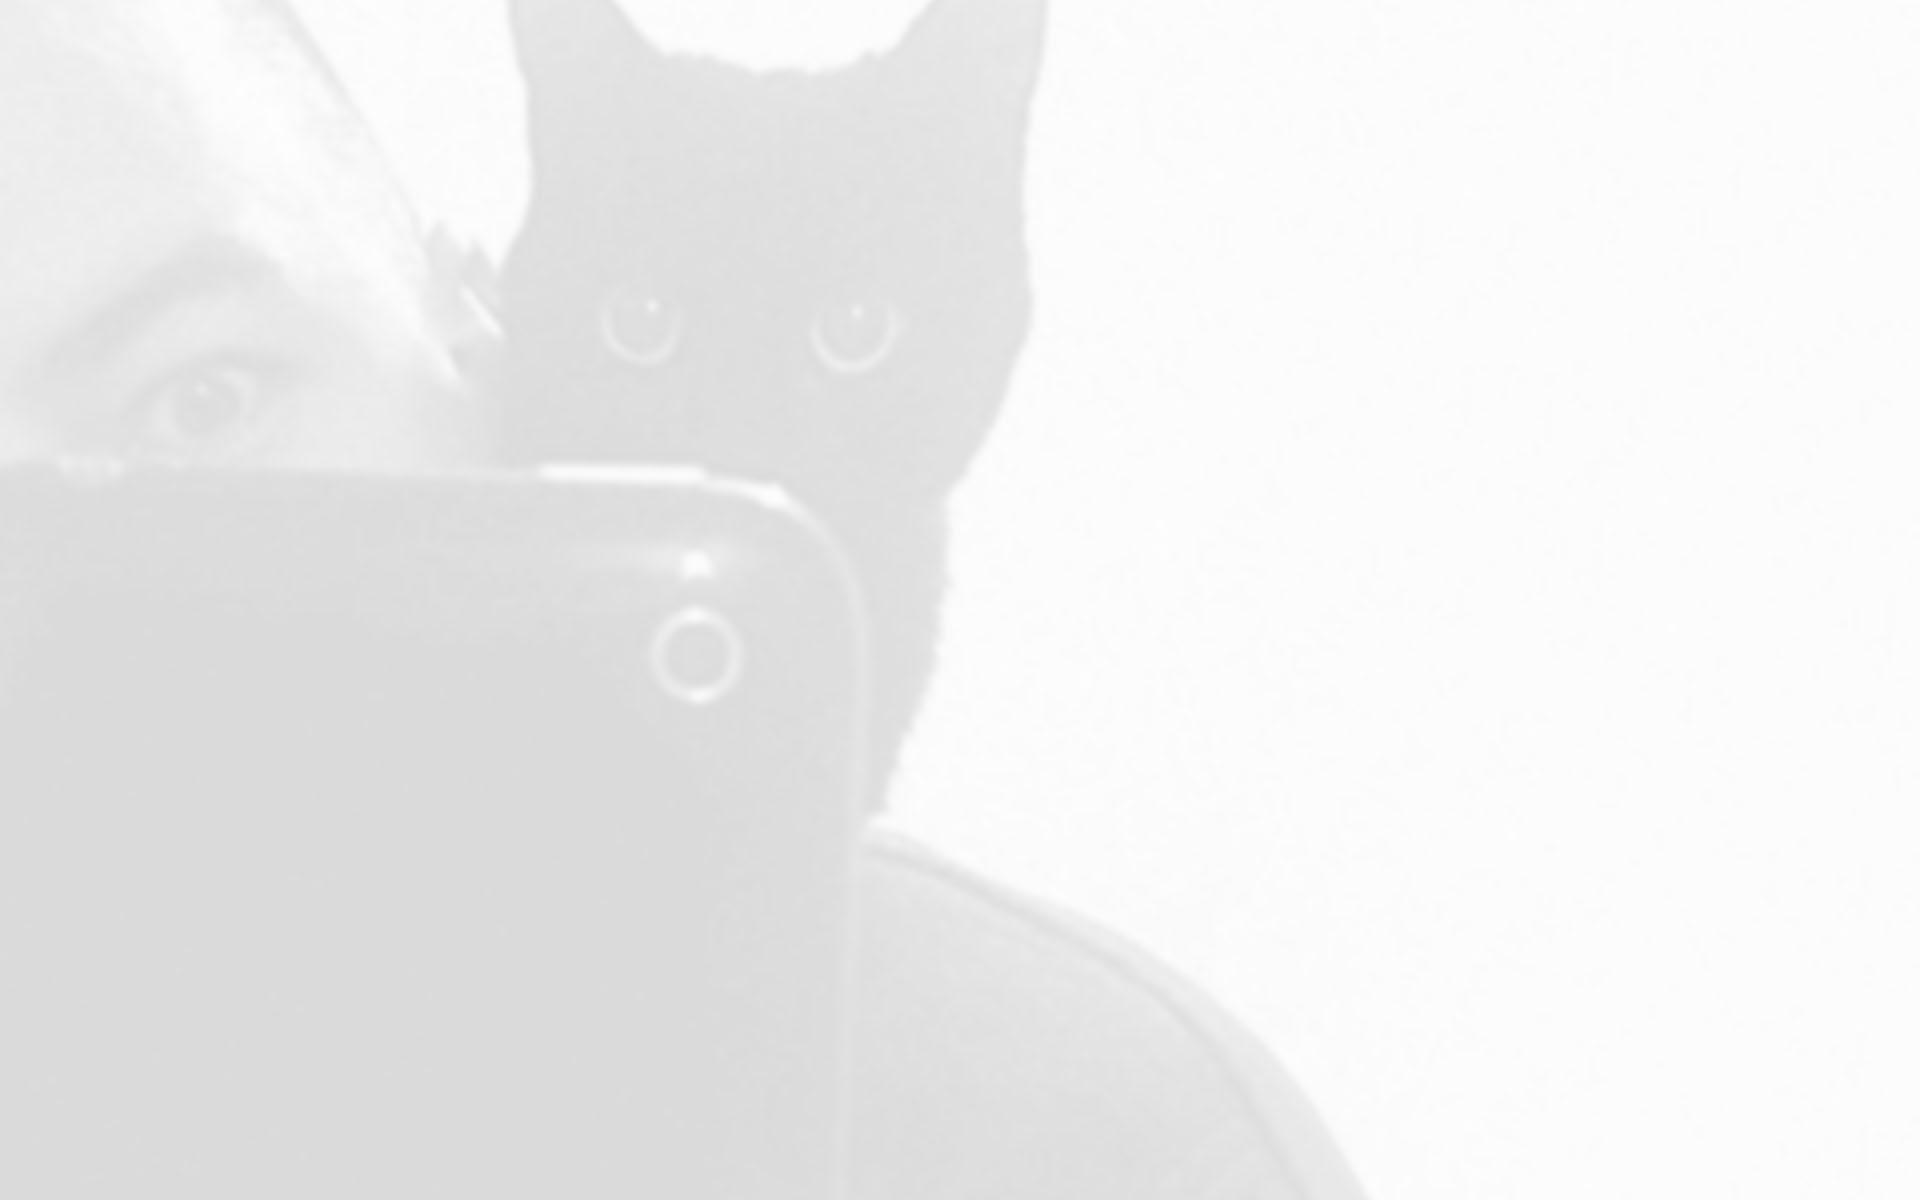 timintro.jpg